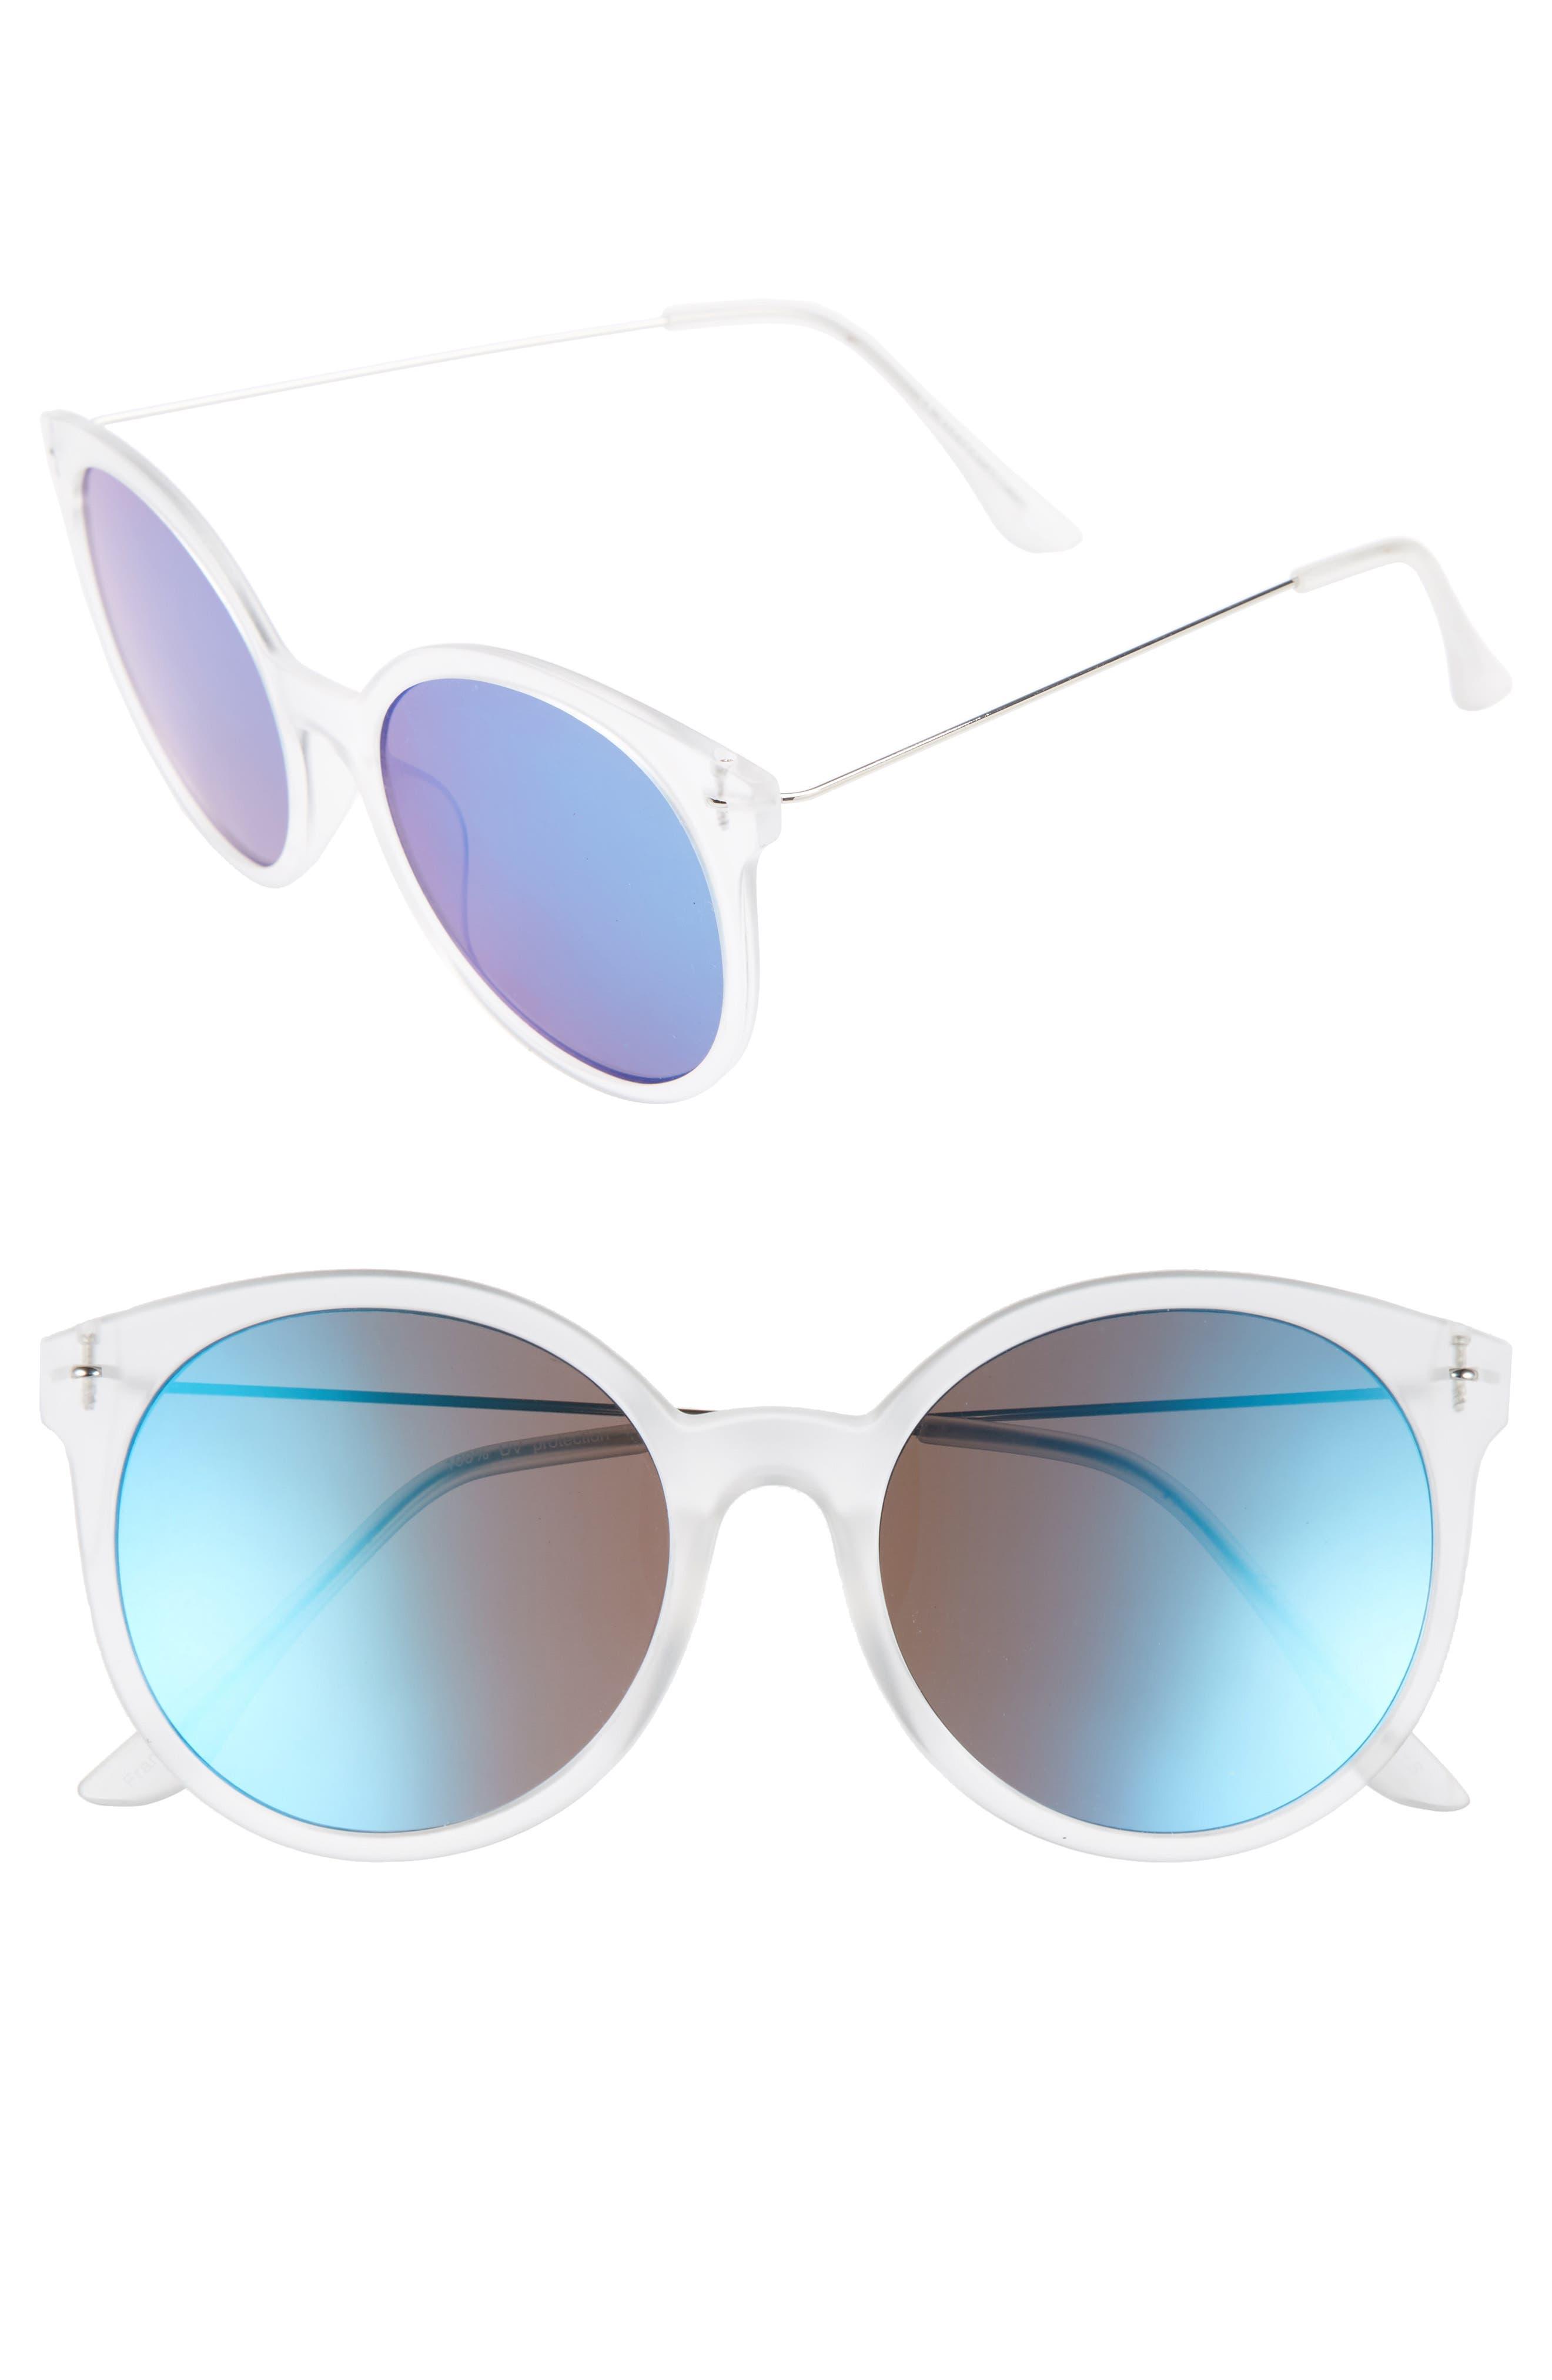 62mm Transparent Round Lens Sunglasses,                         Main,                         color, Clear/ Blue